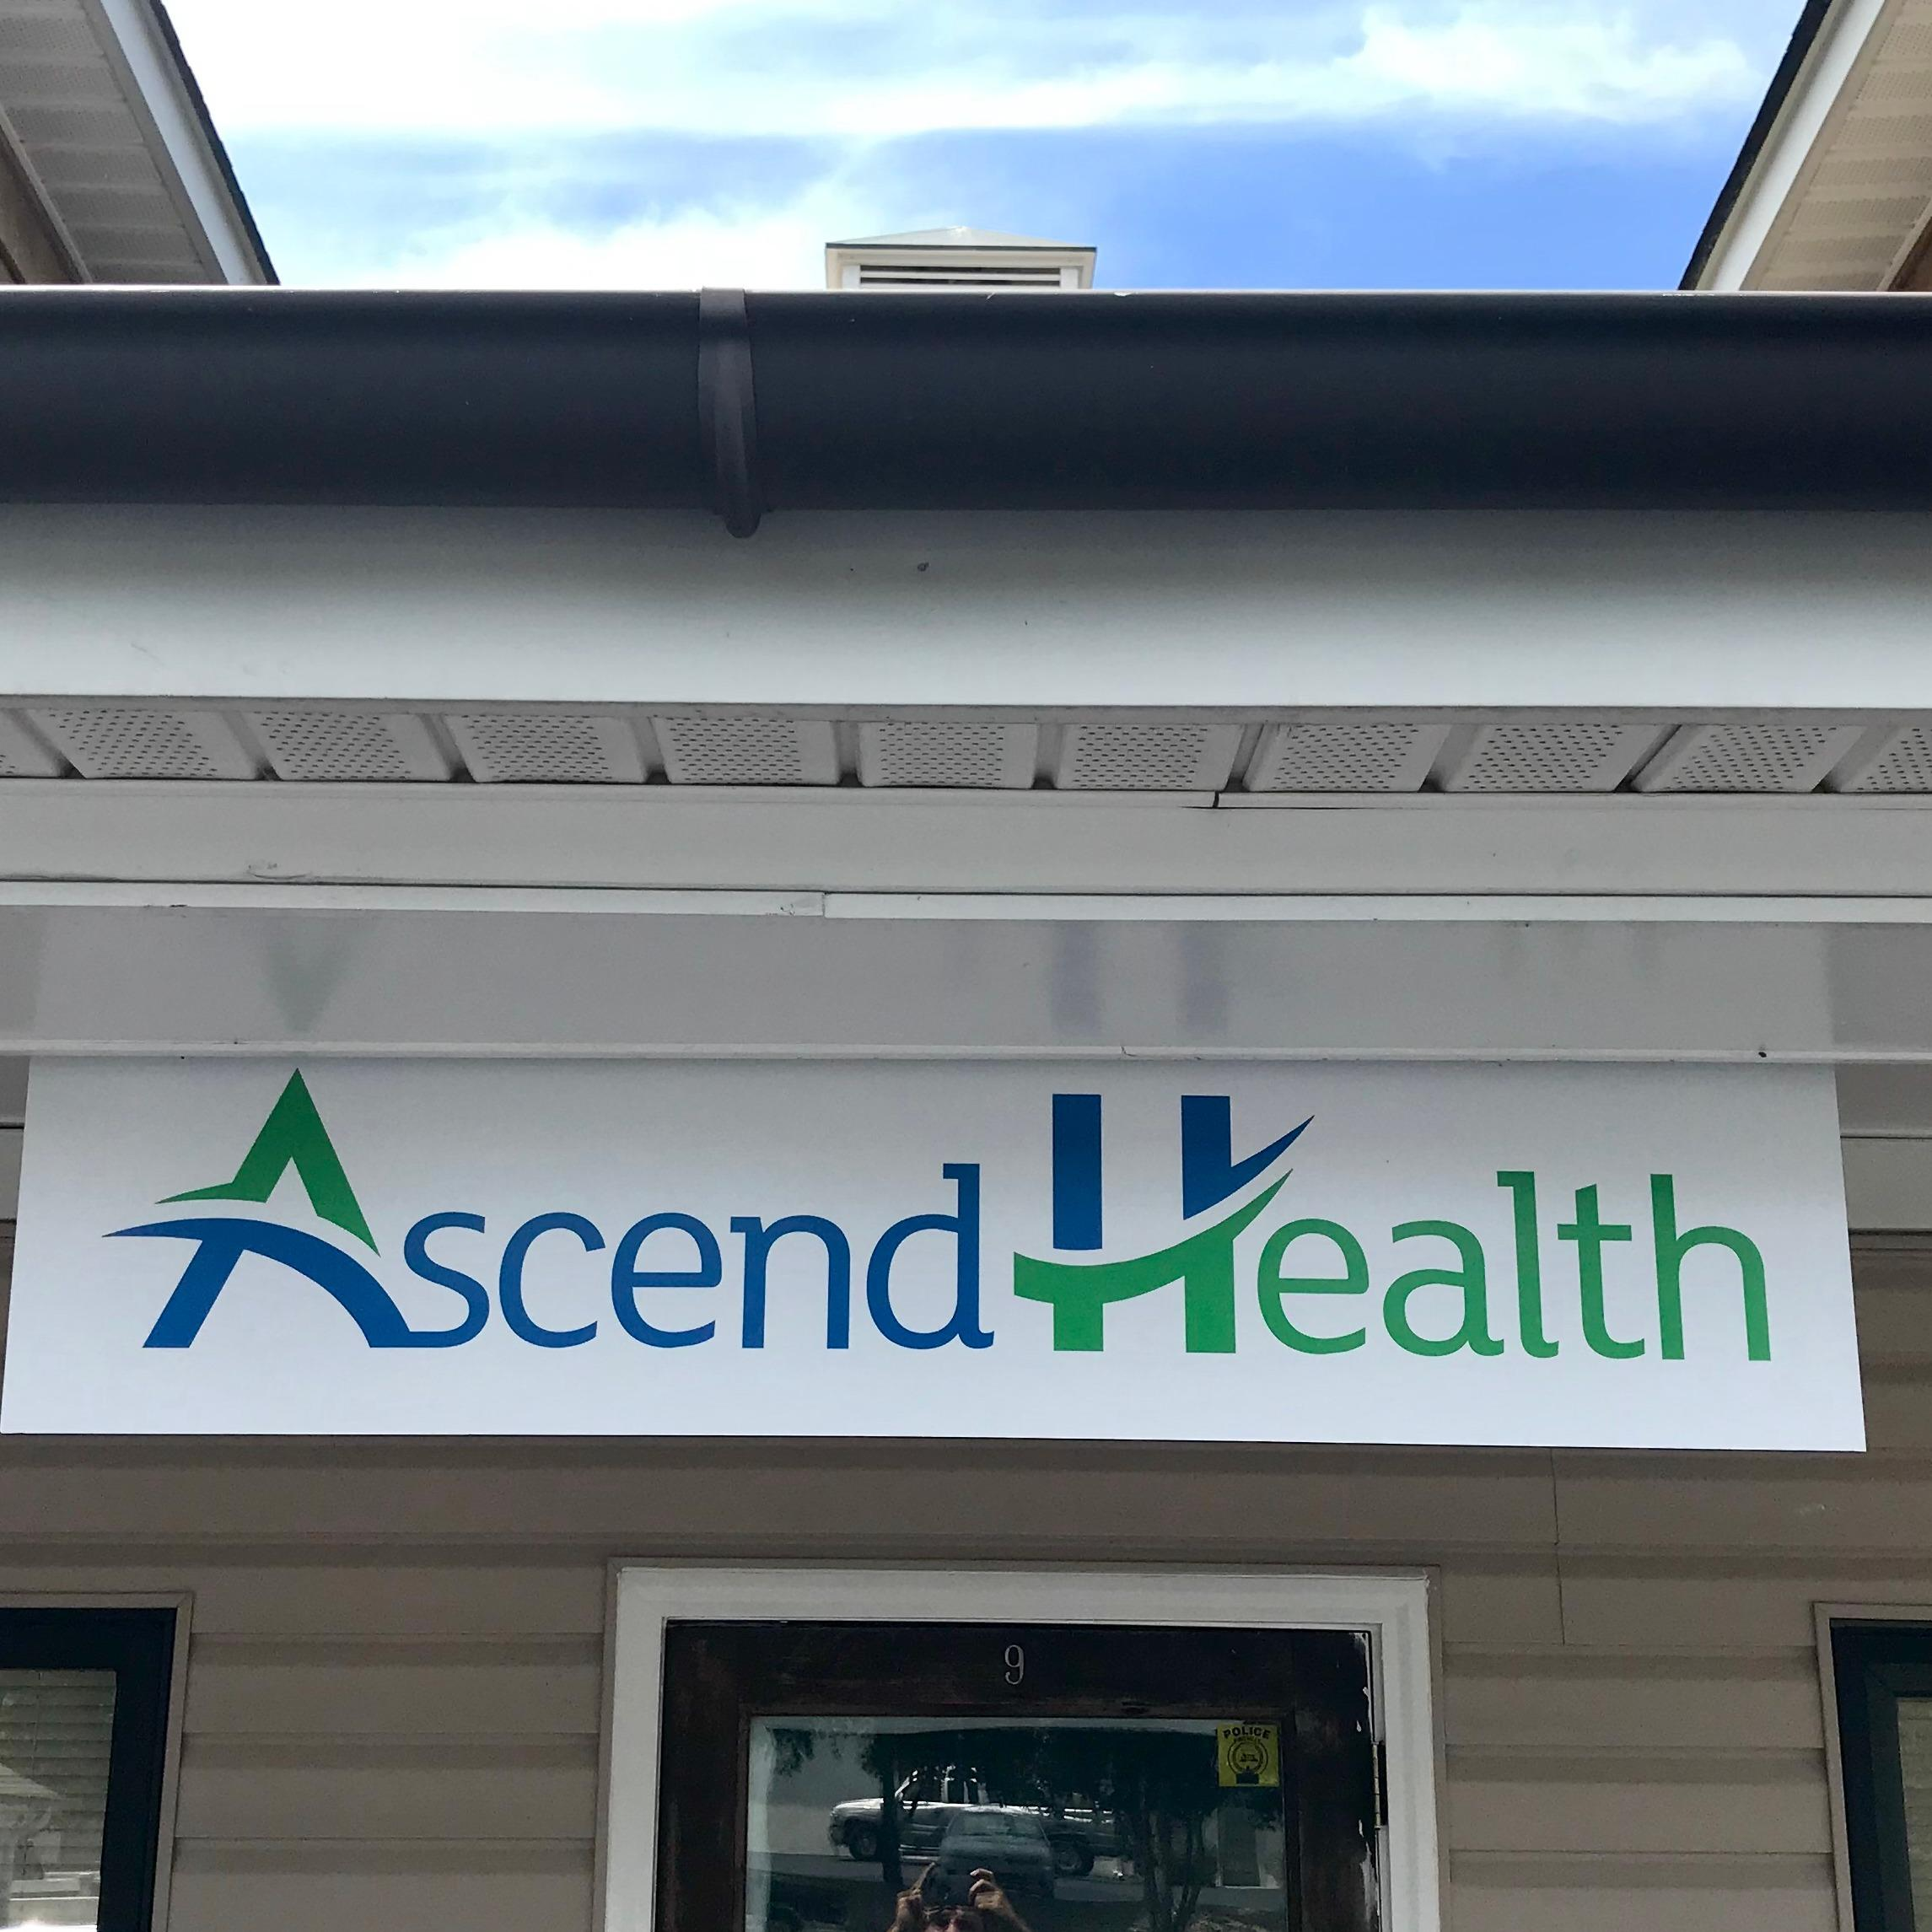 Ascend Health PLLC - Pineville, NC 28134 - (980)579-4889 | ShowMeLocal.com